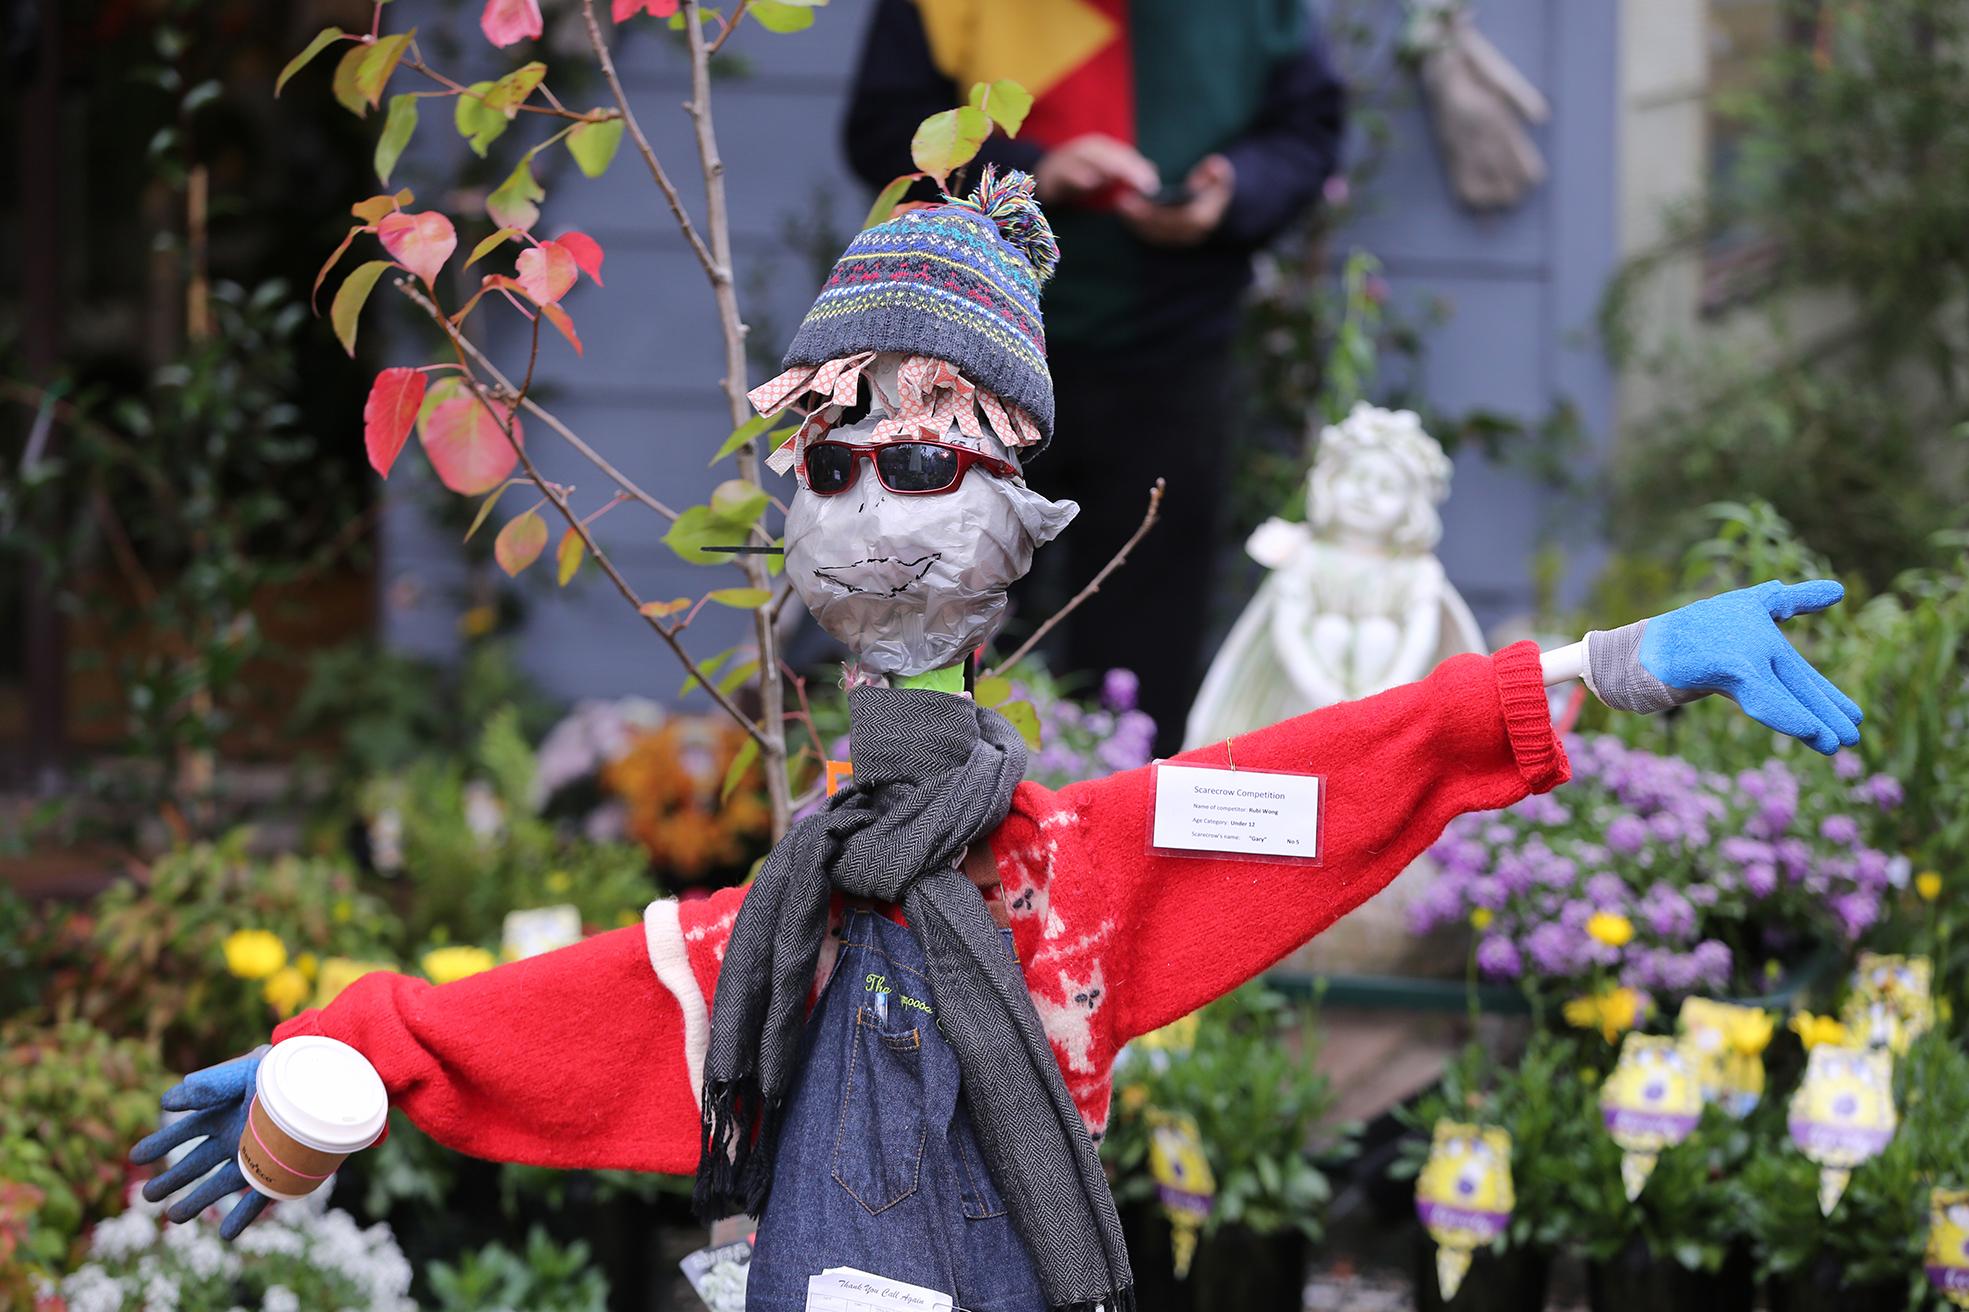 ScarecrowComp_4_lowres.jpg